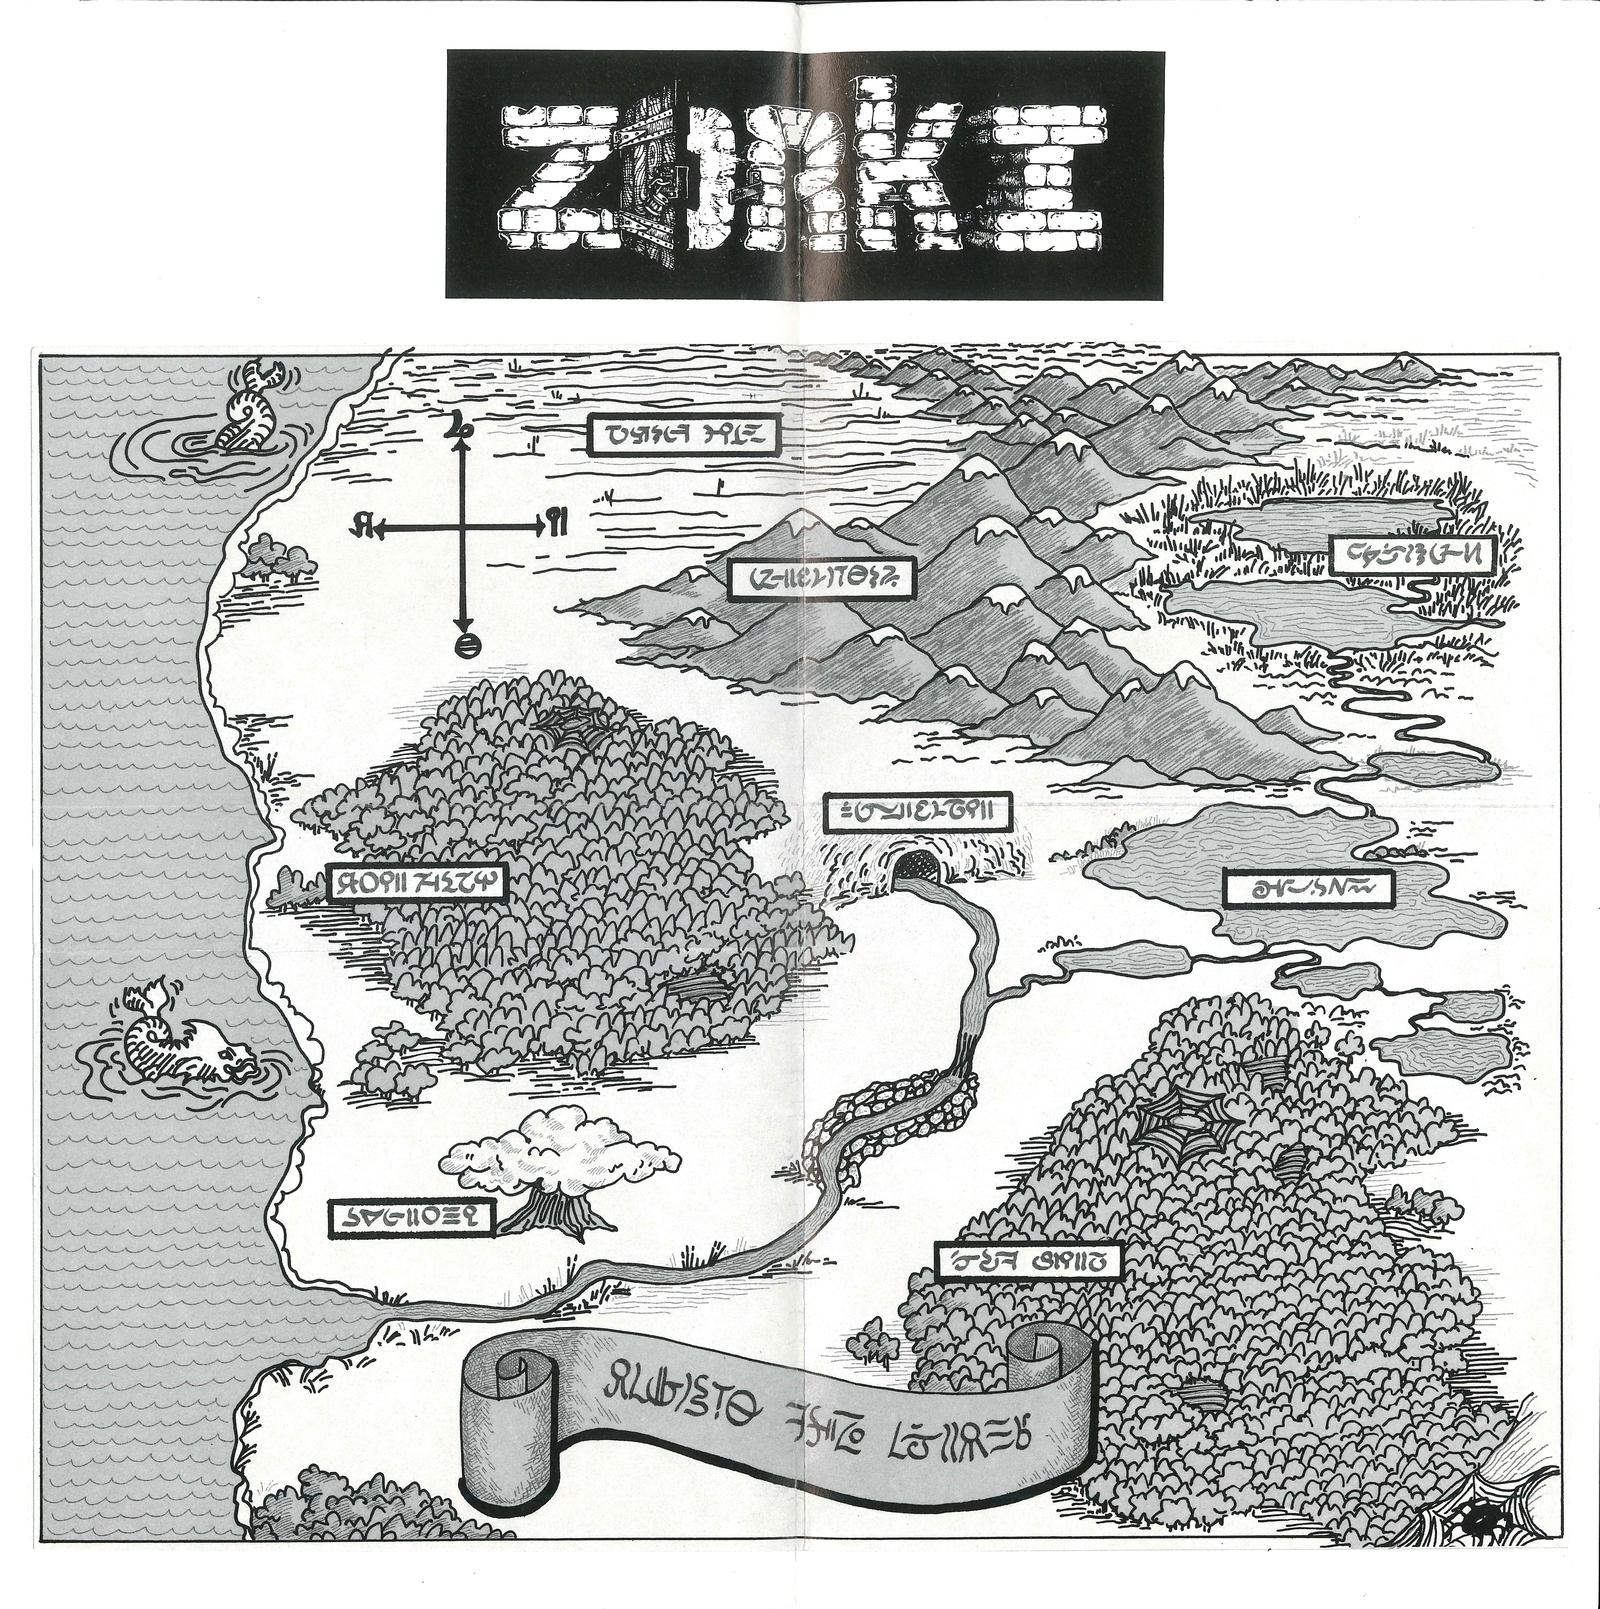 Atari ST Zork I - Great Underground Empire (The) : scans